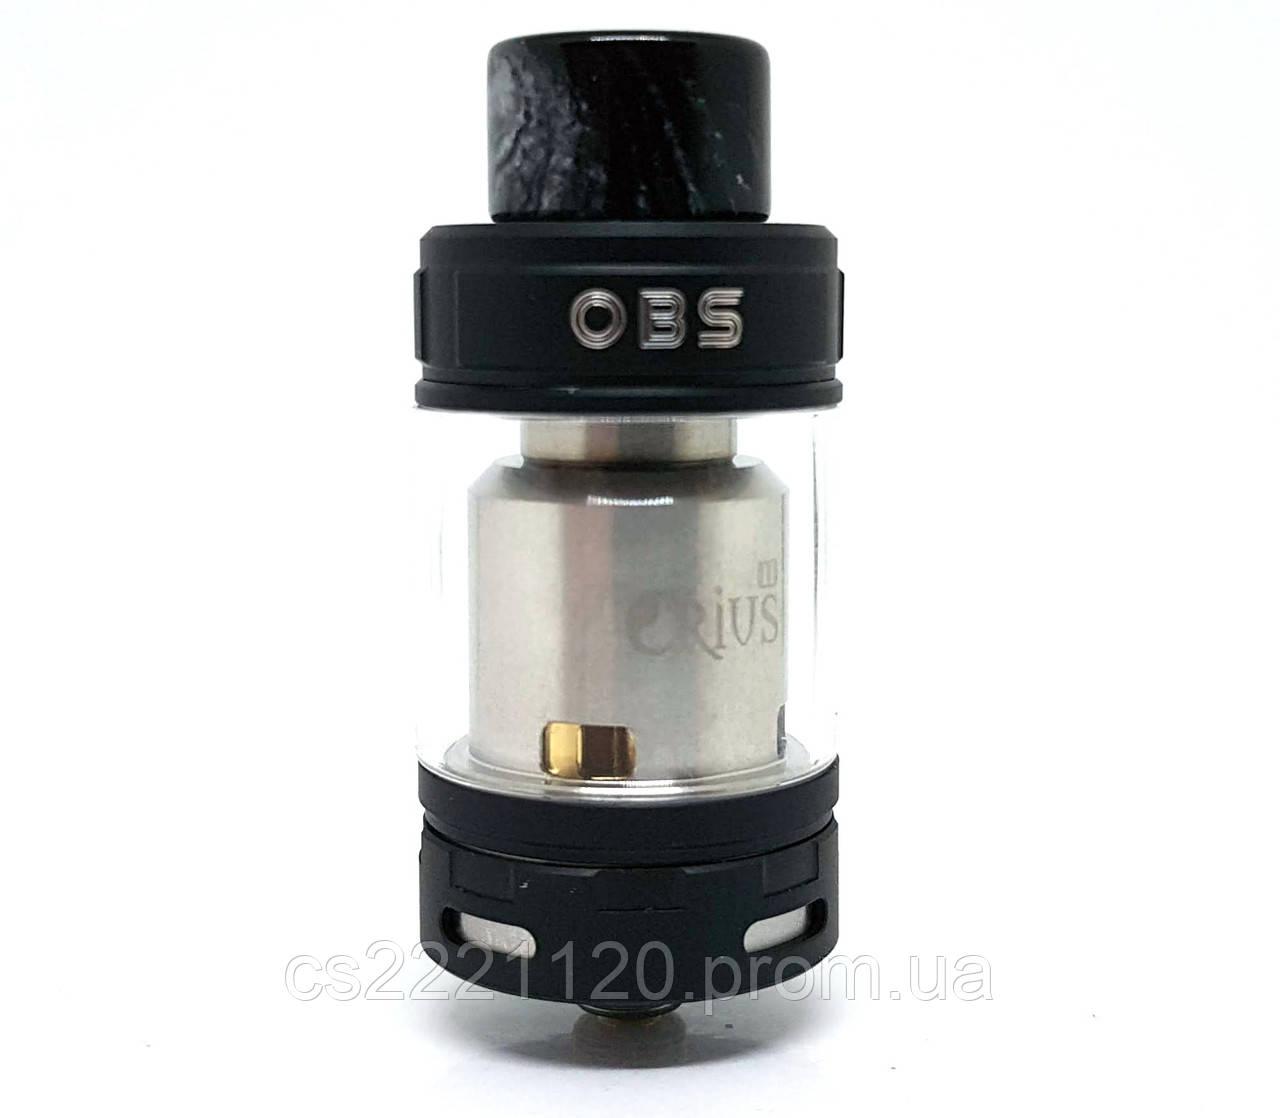 OBS Crius II RTA Dual (черный)